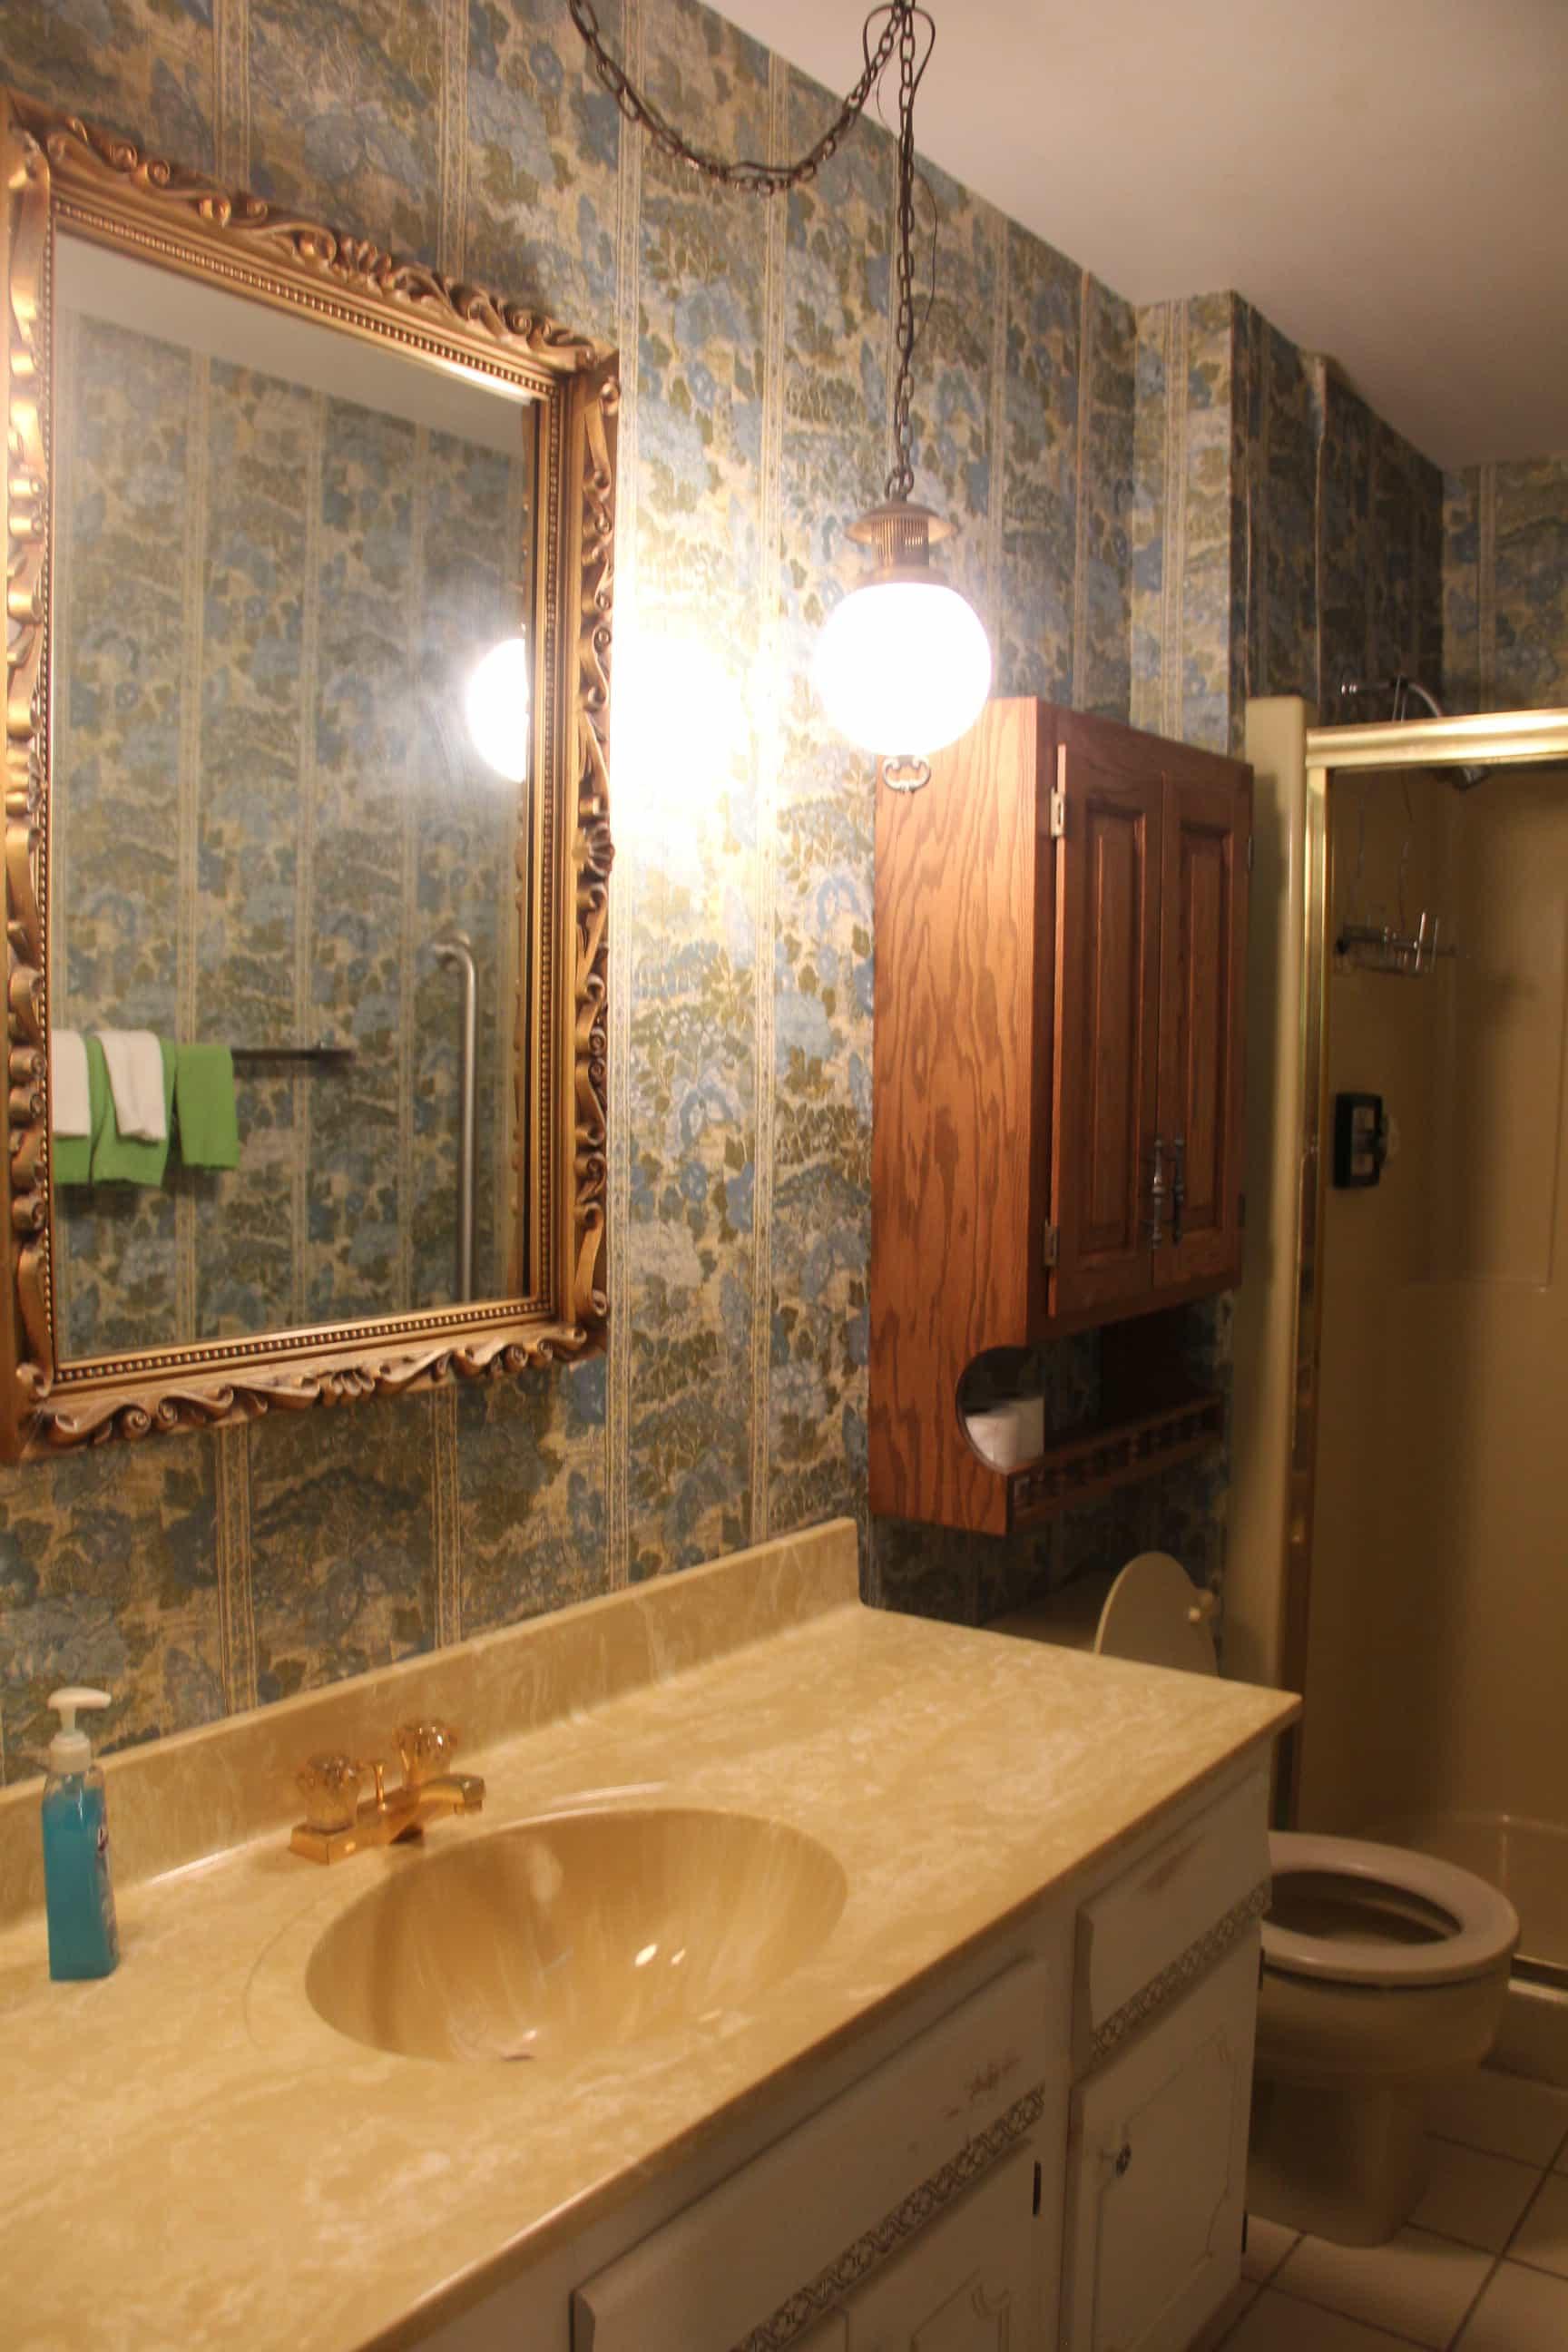 Best Kitchen Gallery: Modern Bathroom Design Inspiration Bright Green Door of Bathroom Design Inspiration  on rachelxblog.com